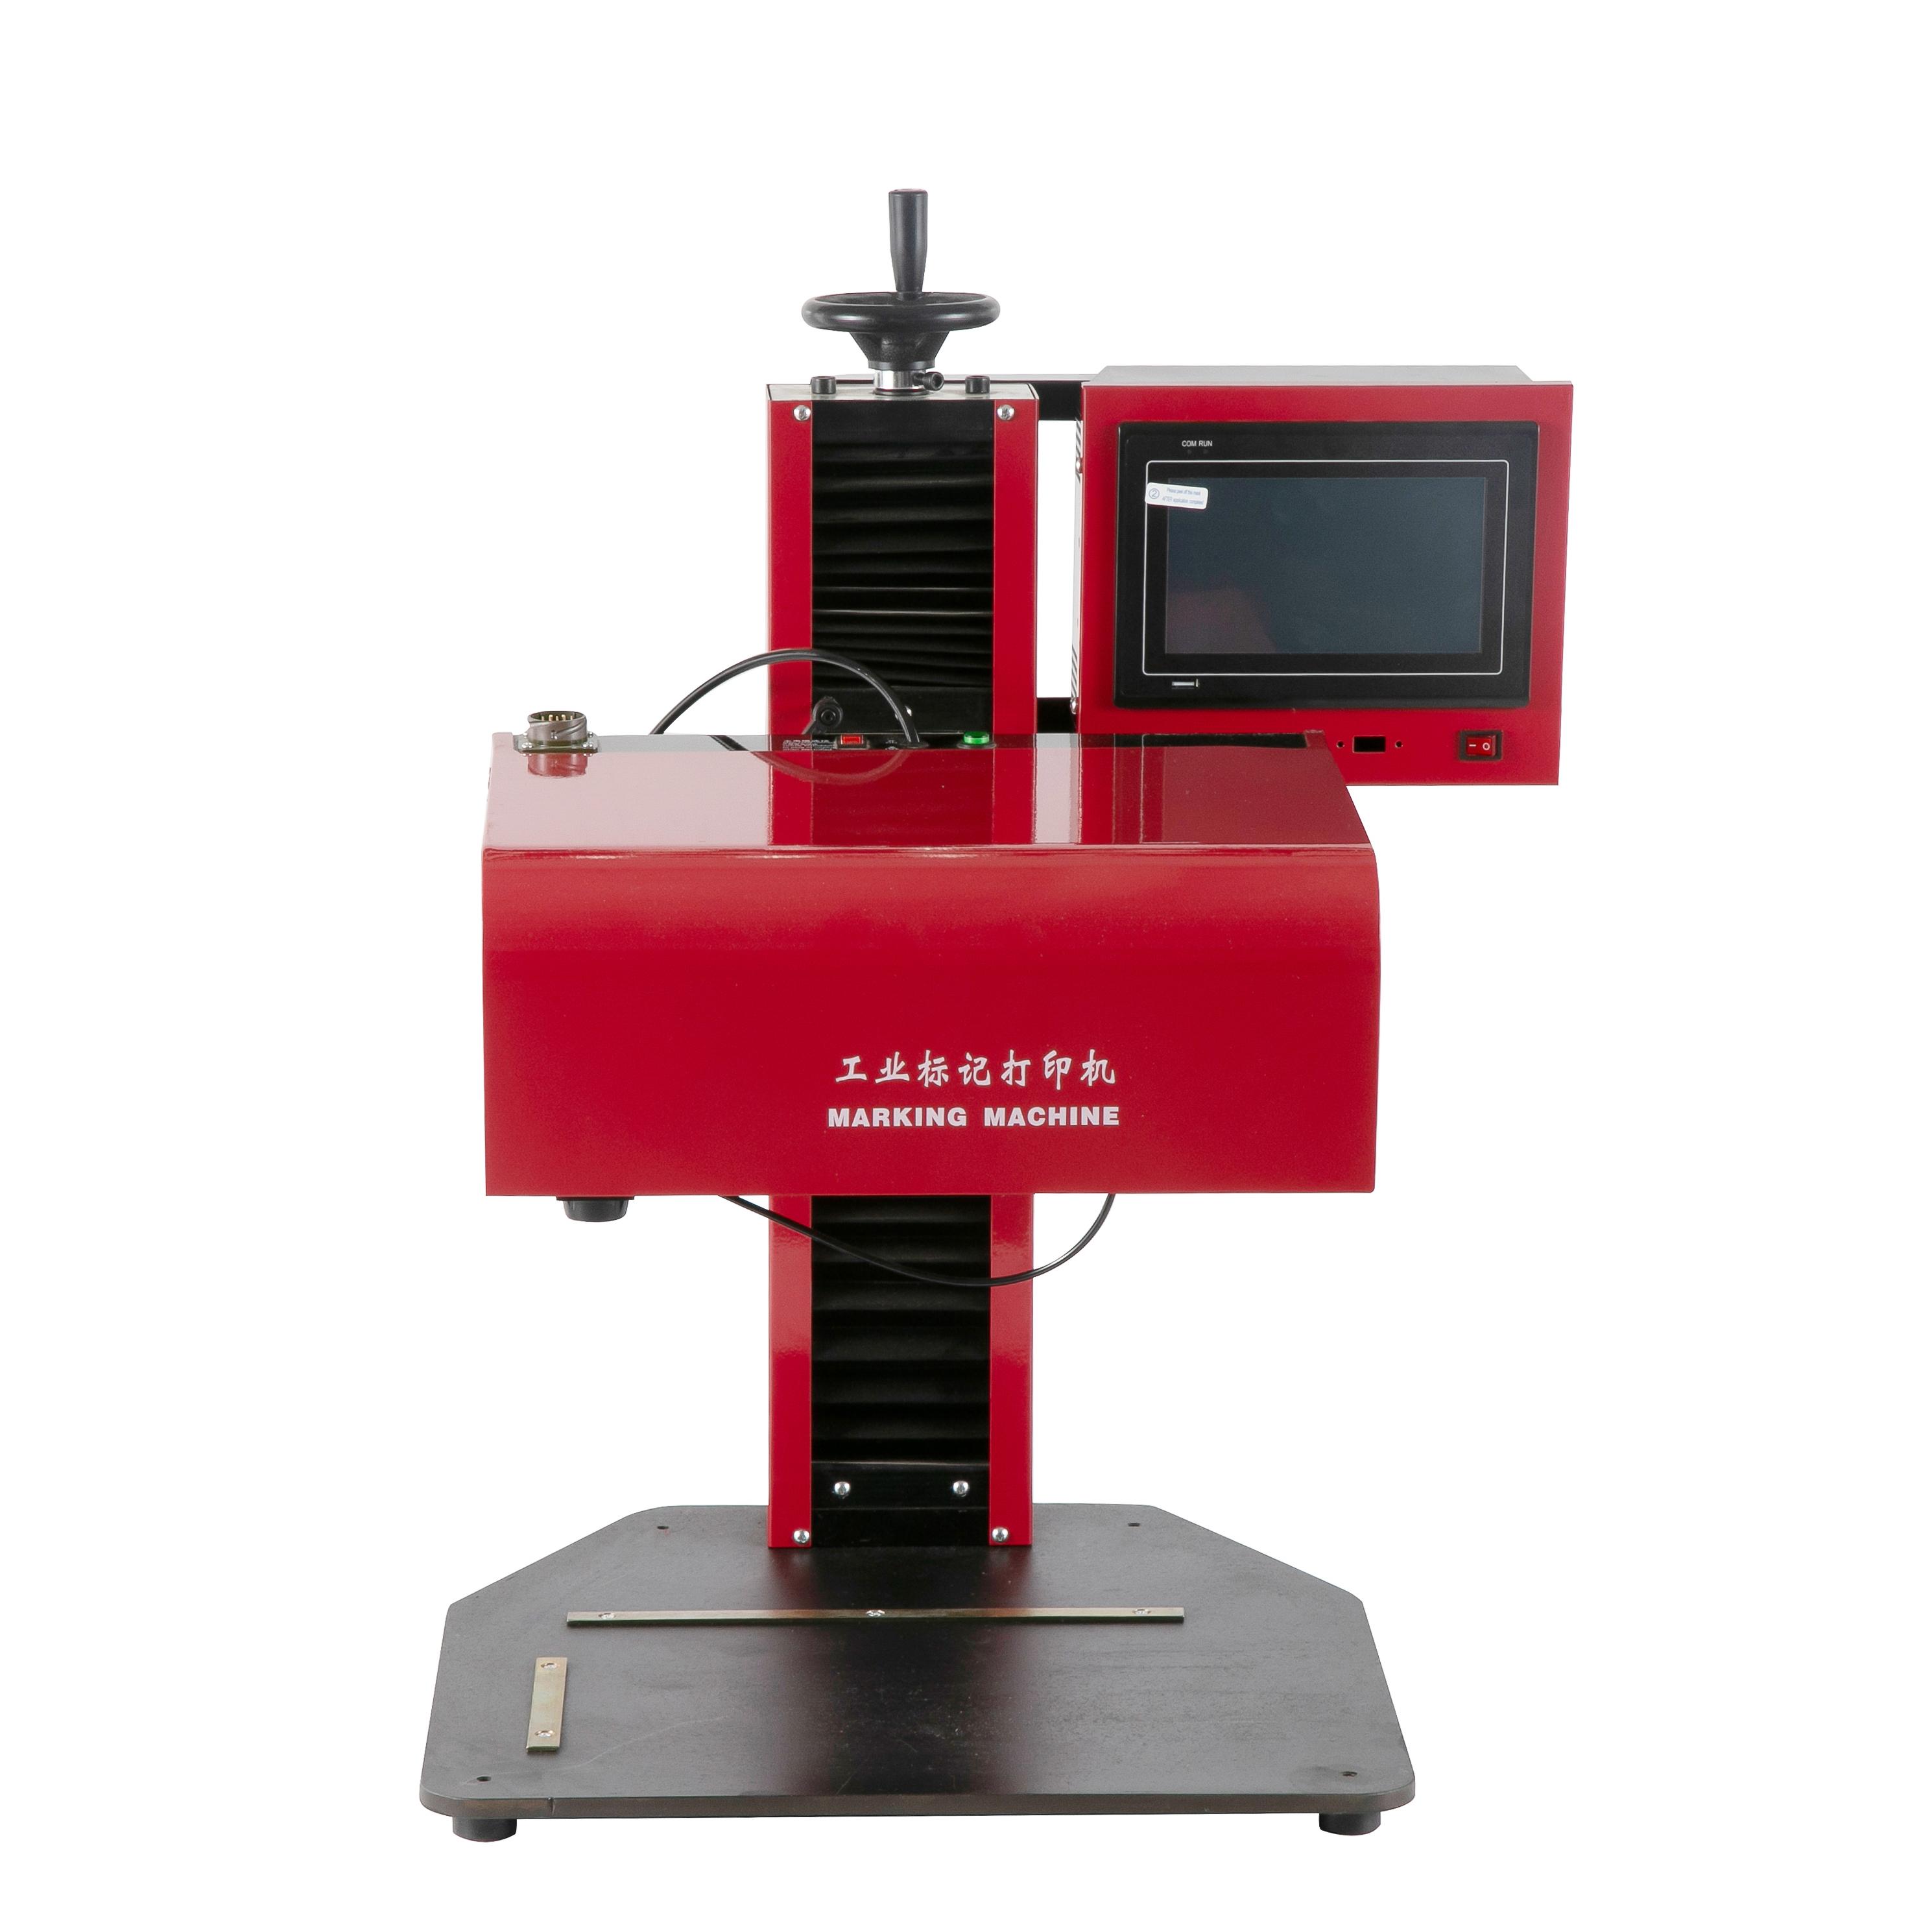 cnc system desktop cnc pneumatic dot peen marking machine for metal needle marking